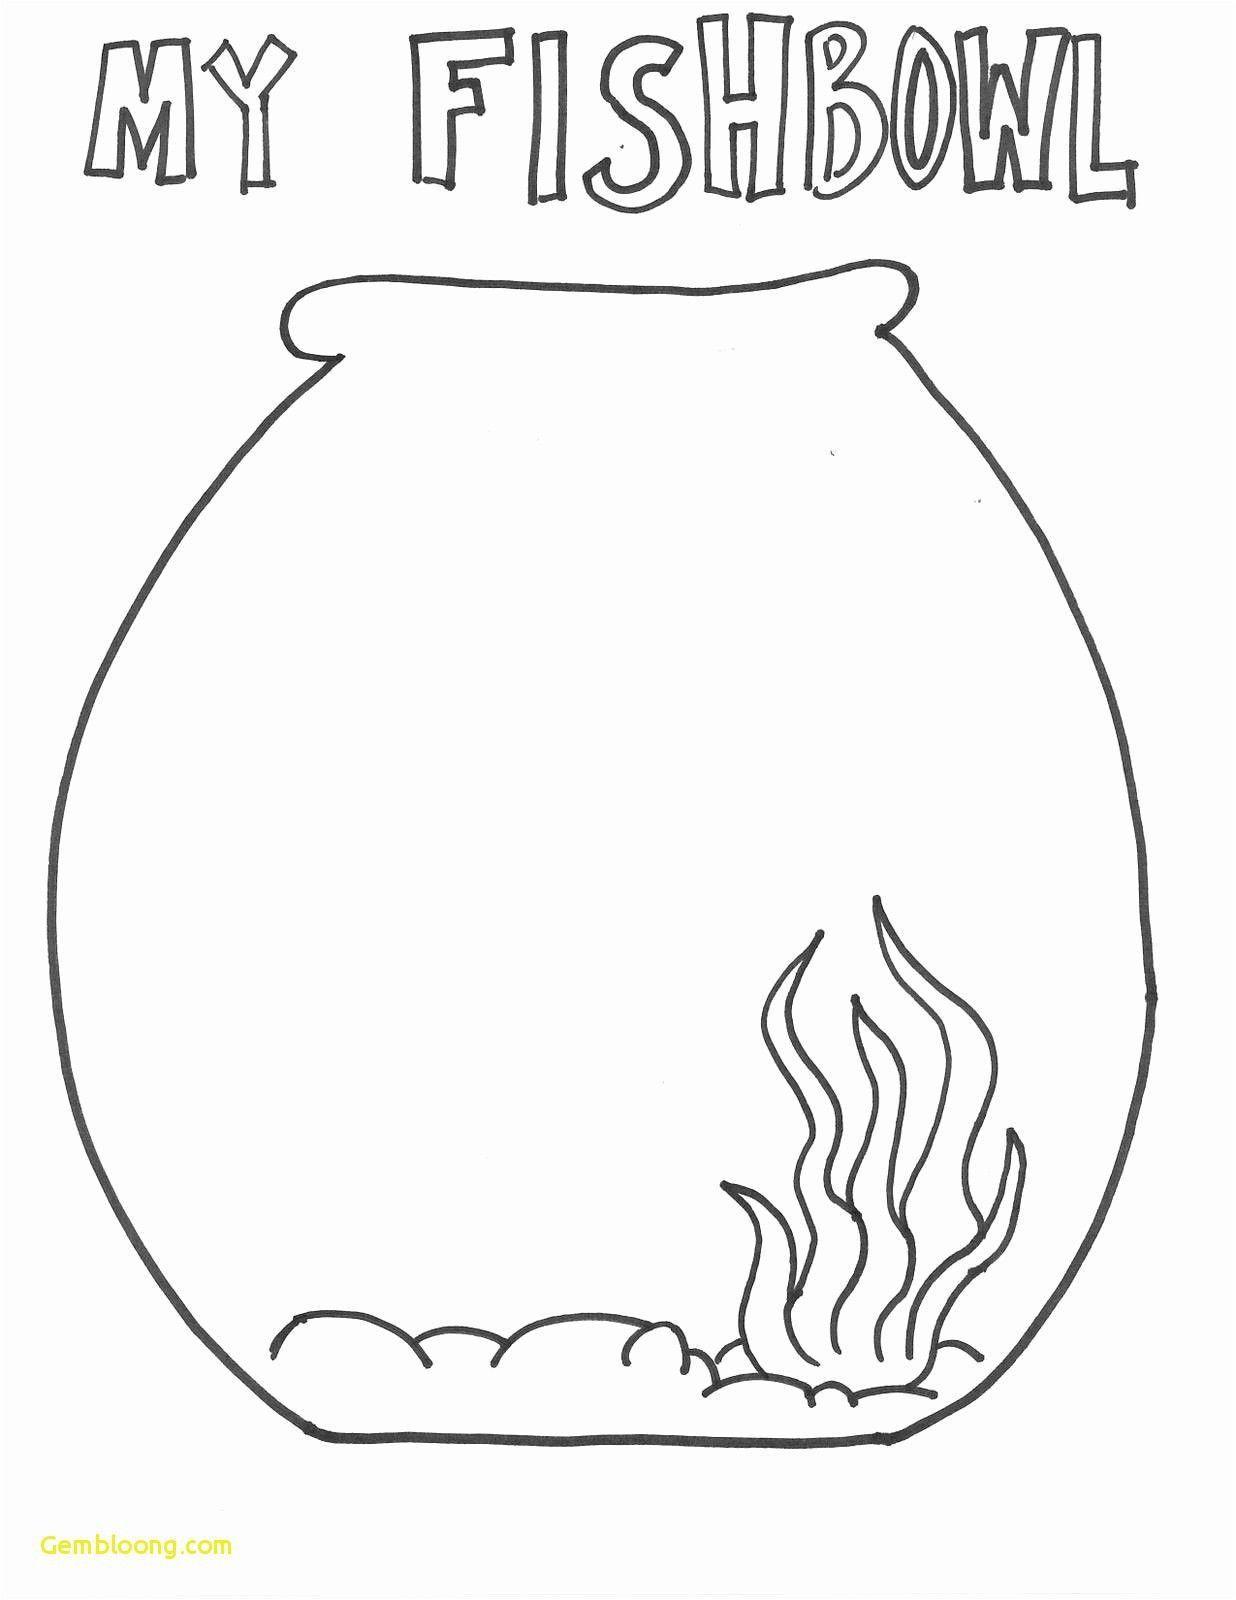 Fish Bowl Coloring Page Youngandtae Com Fish Coloring Page Fish Bowl Coloring Pages